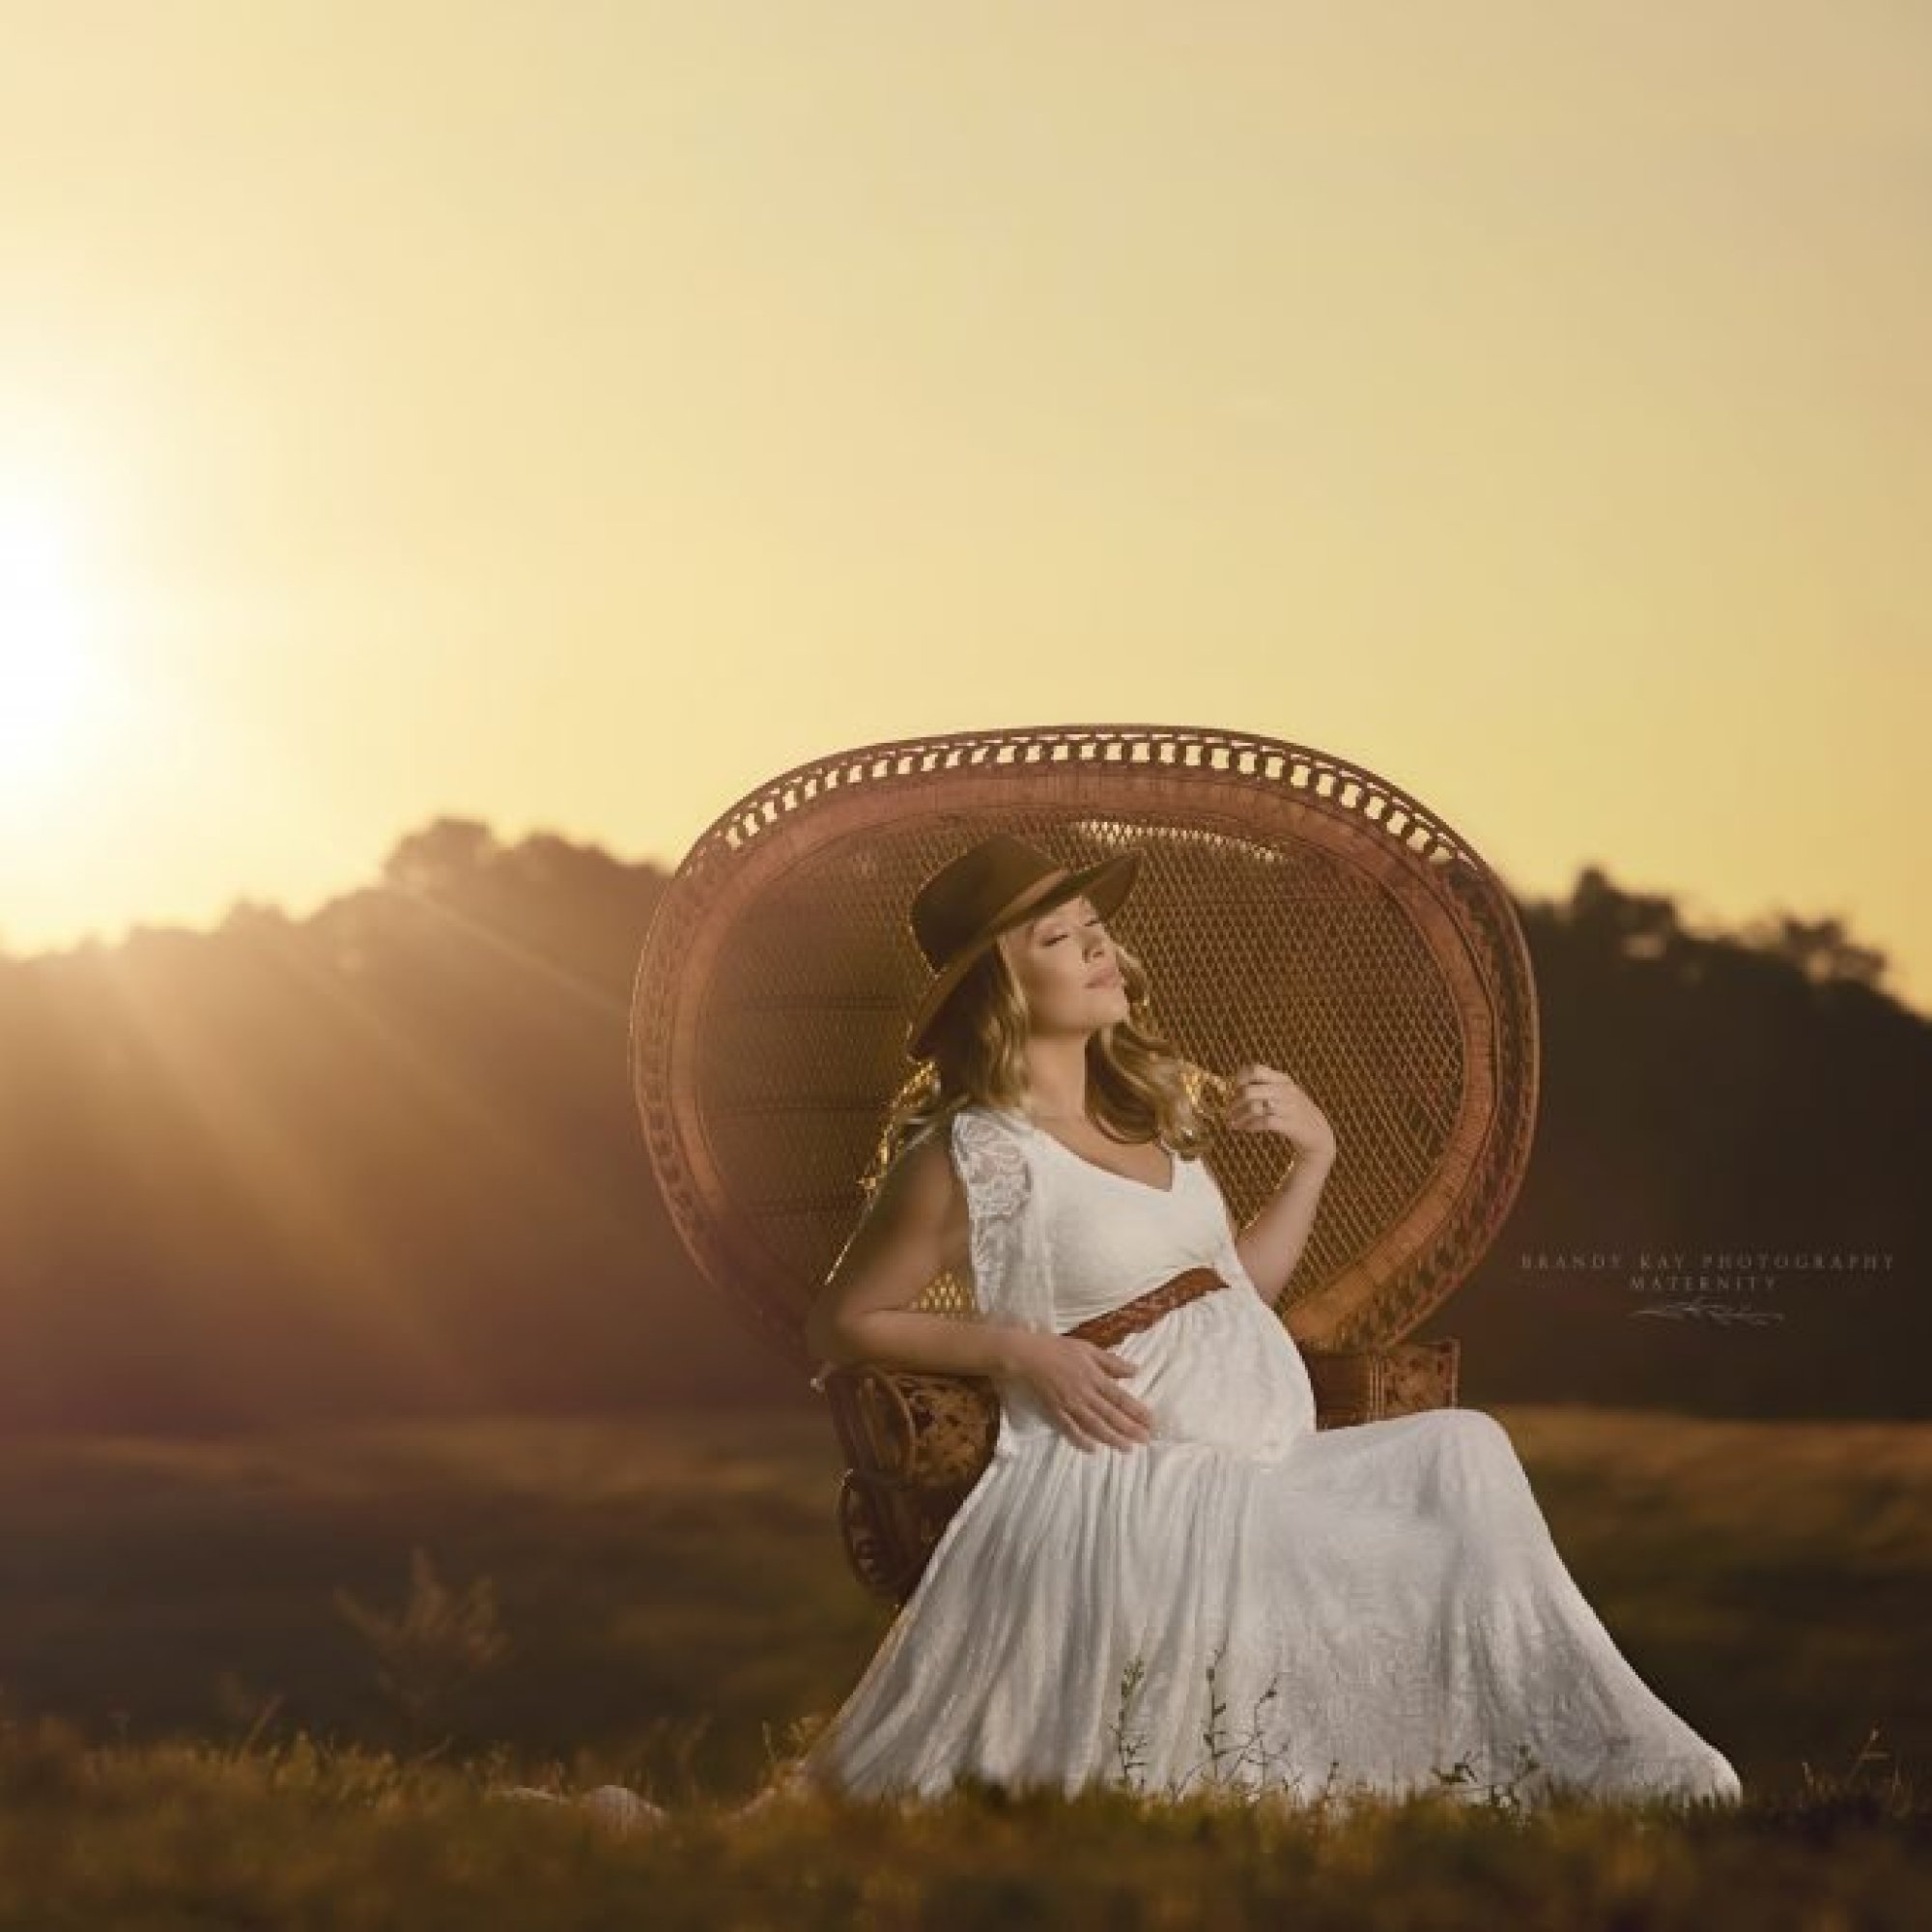 maternity maxi dress, boho lace maternity gown, bridesmaid gown, maternity gown, dress, baby shower, photography, photoshoot